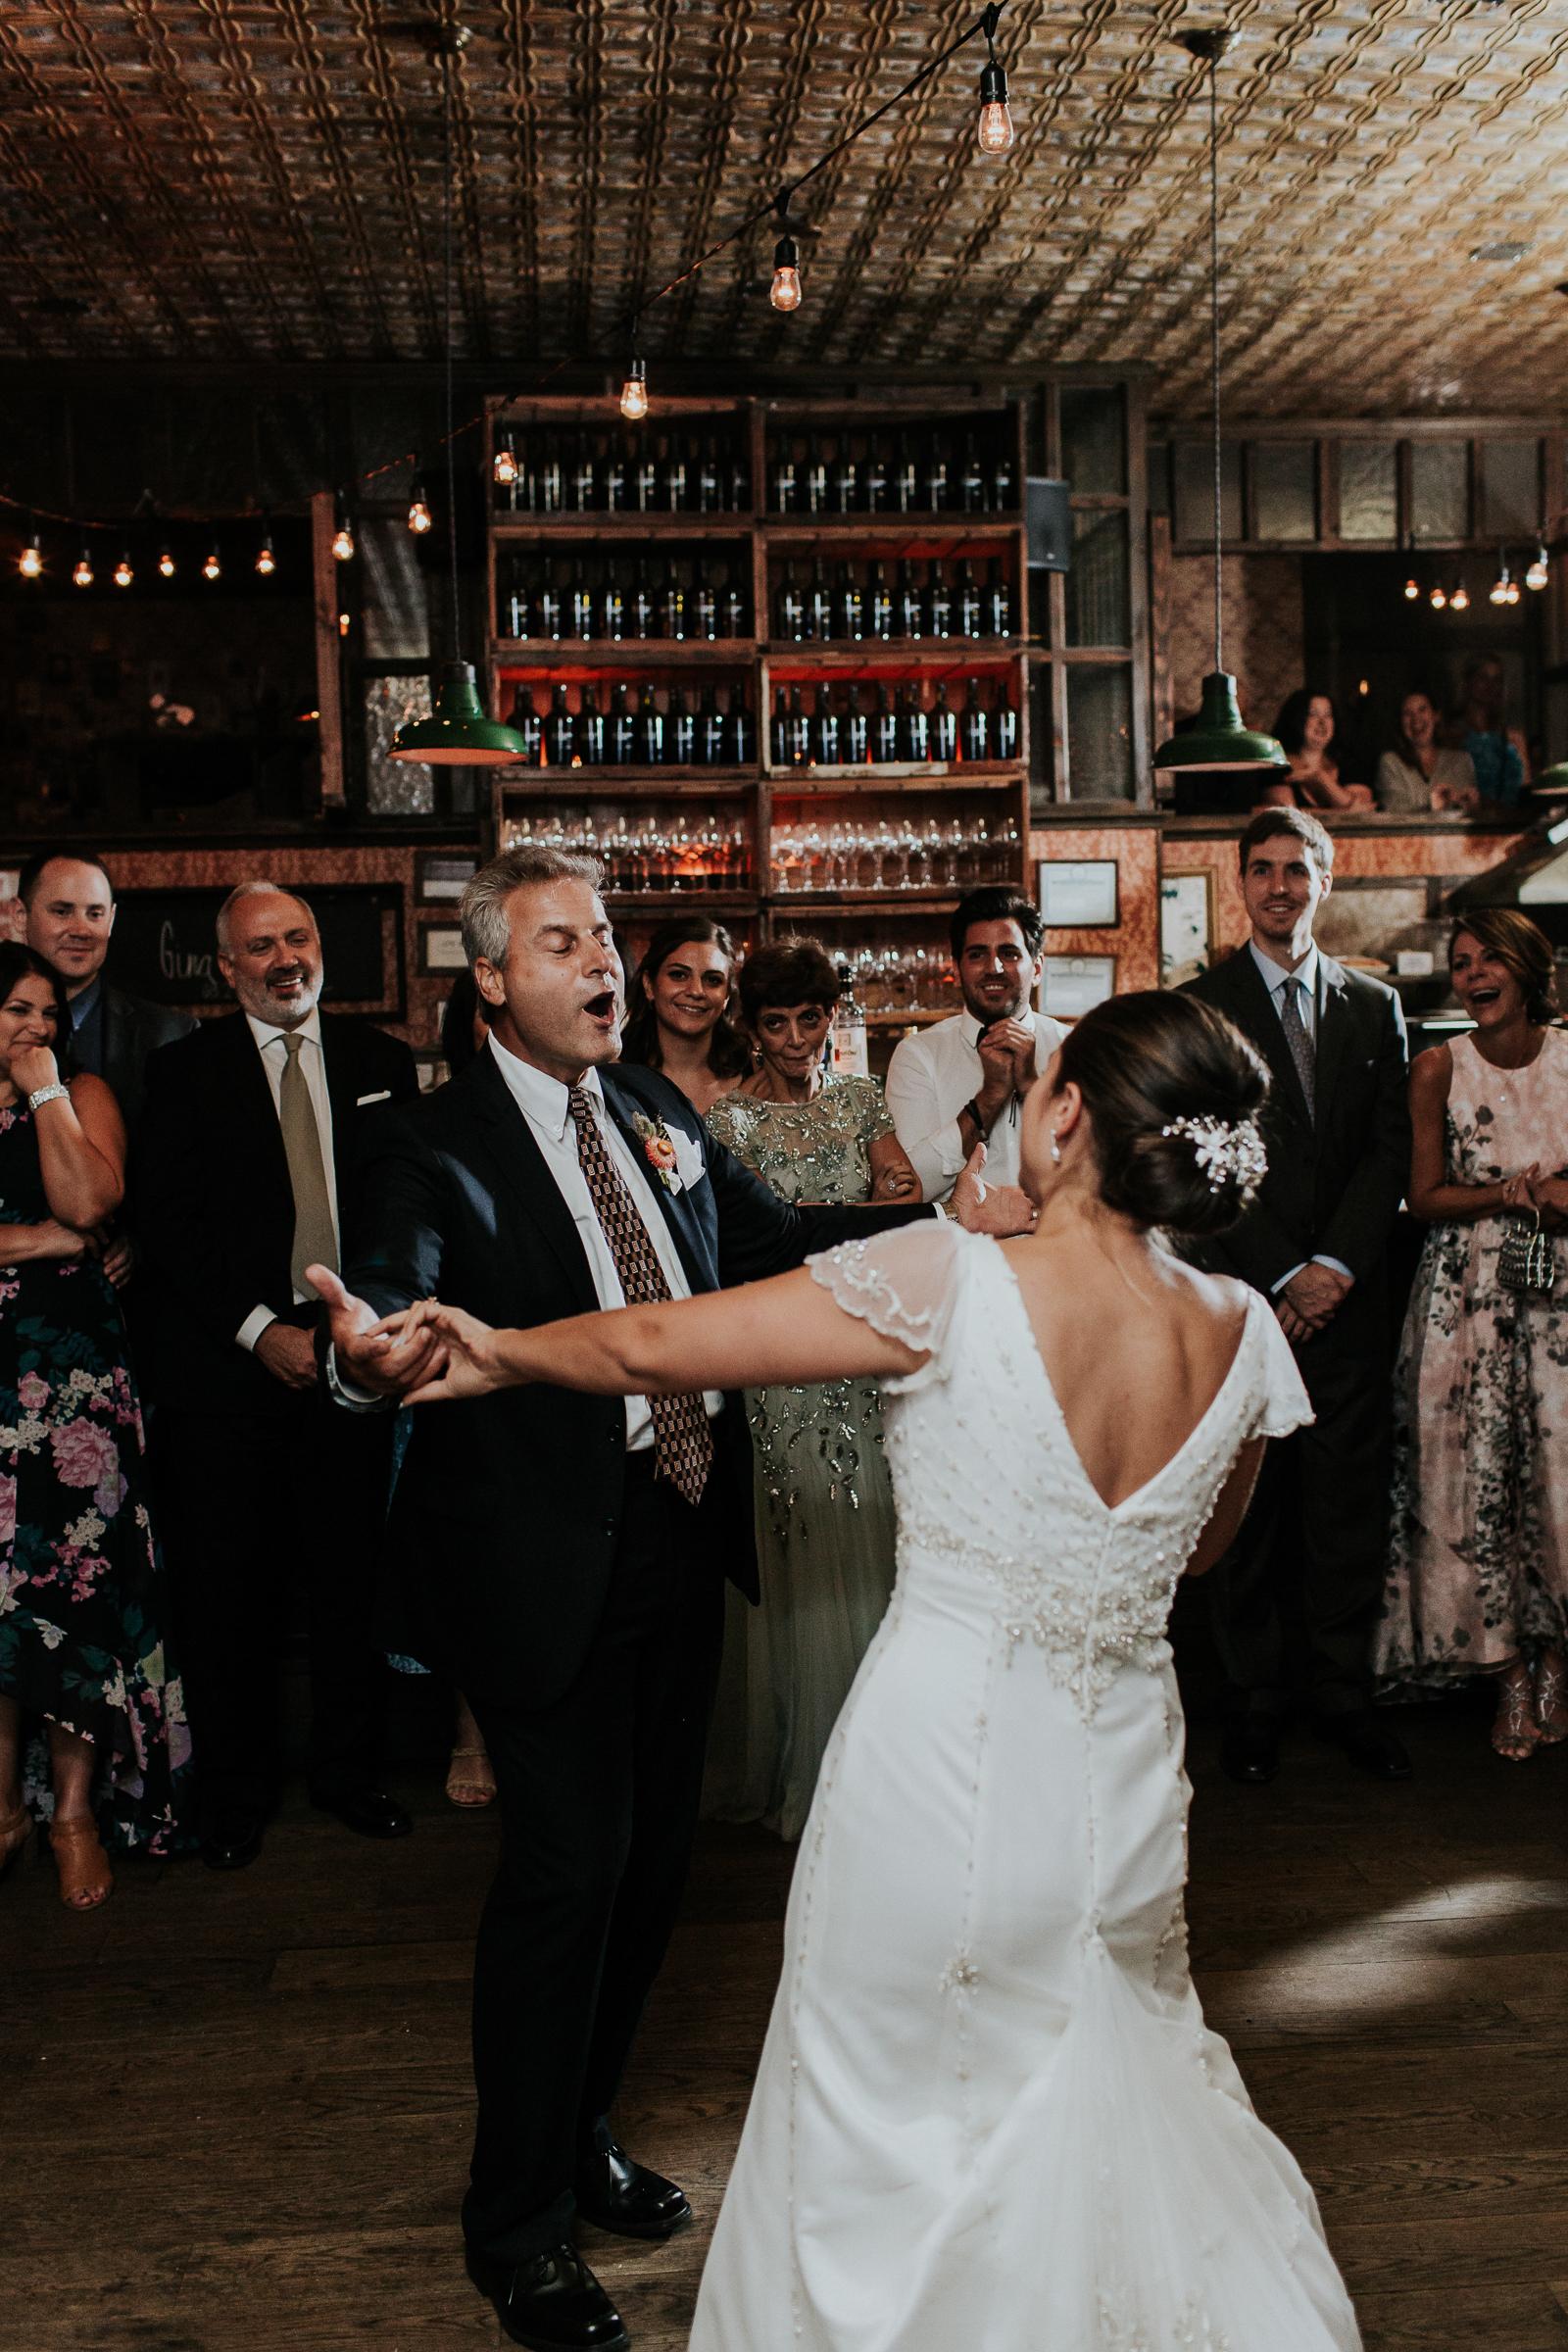 Brooklyn-Winery-NYC-Editorial-Documentary-Wedding-Photographer-Gina-Oli-104.jpg